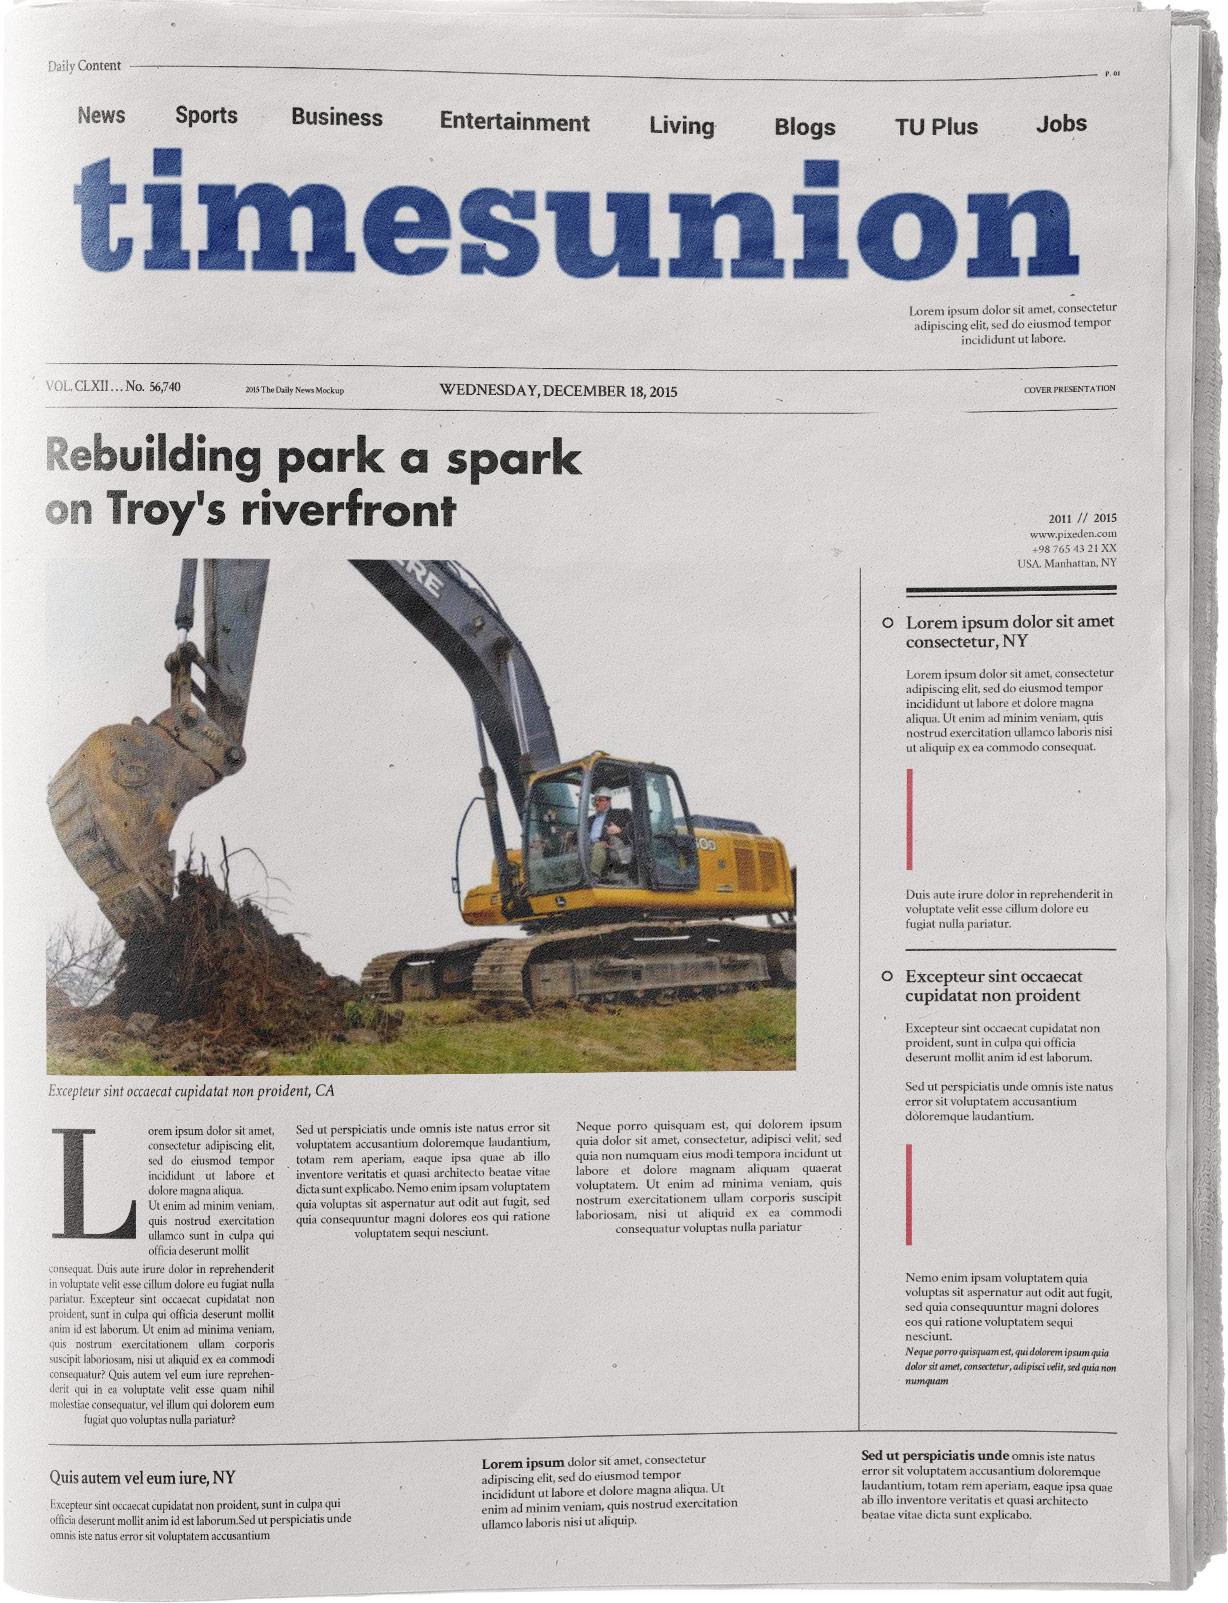 "Crowe, Kenneth C II. ""Rebuilding Park a Spark on Troy's Riverfront"" Times Union, Dec 27, 2011."